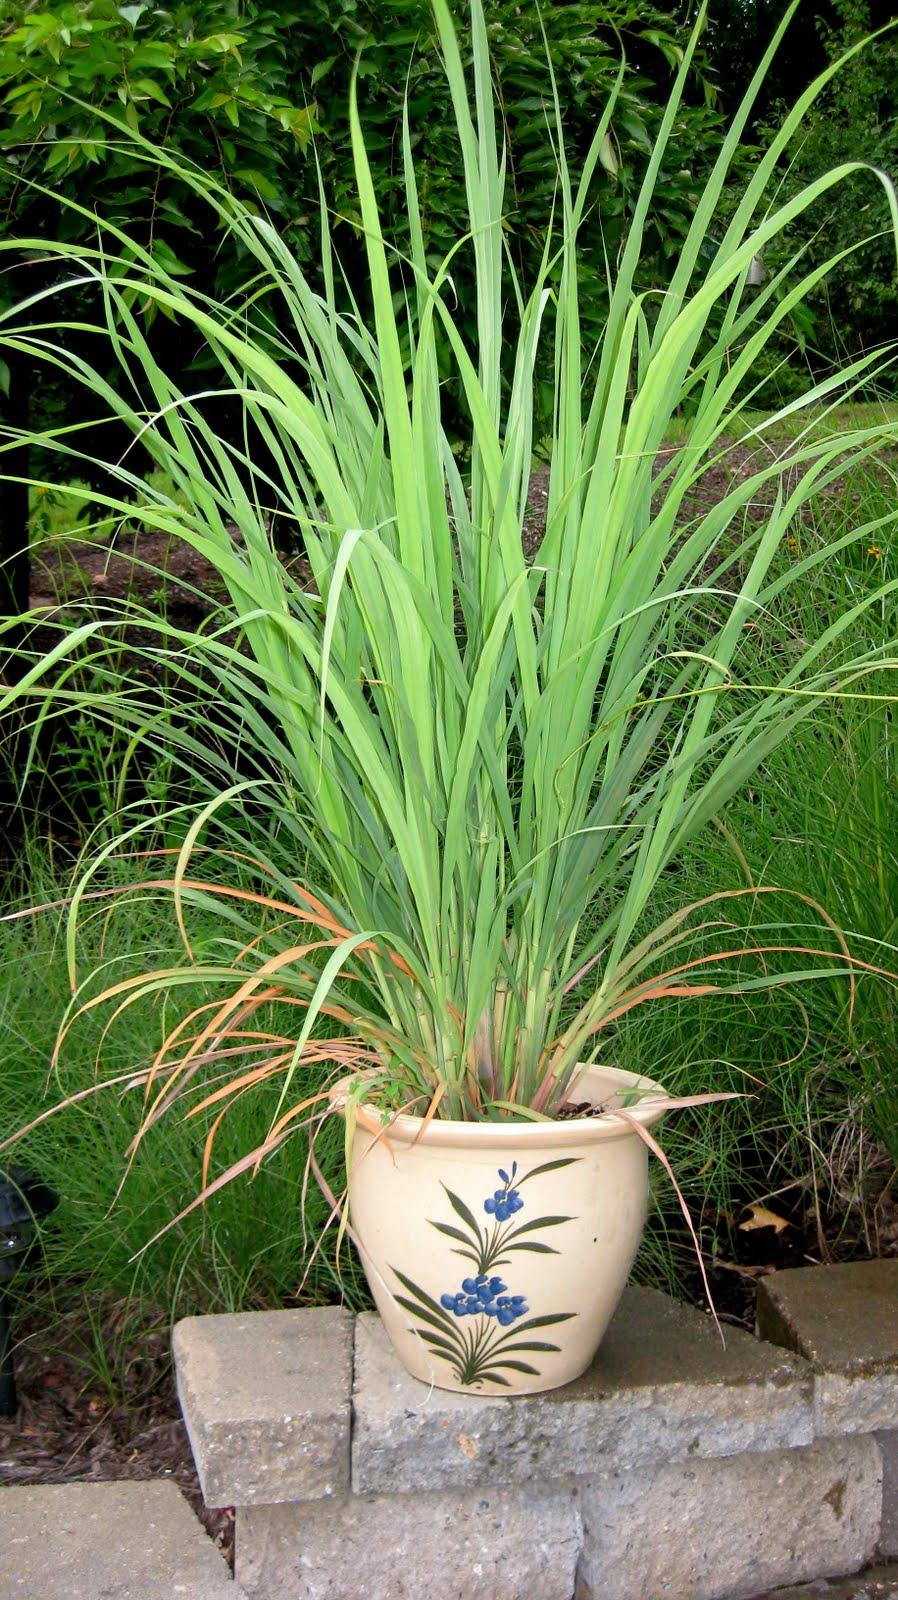 Logee's Tropical Plants Blog: Keep Your Tropical Plants ...